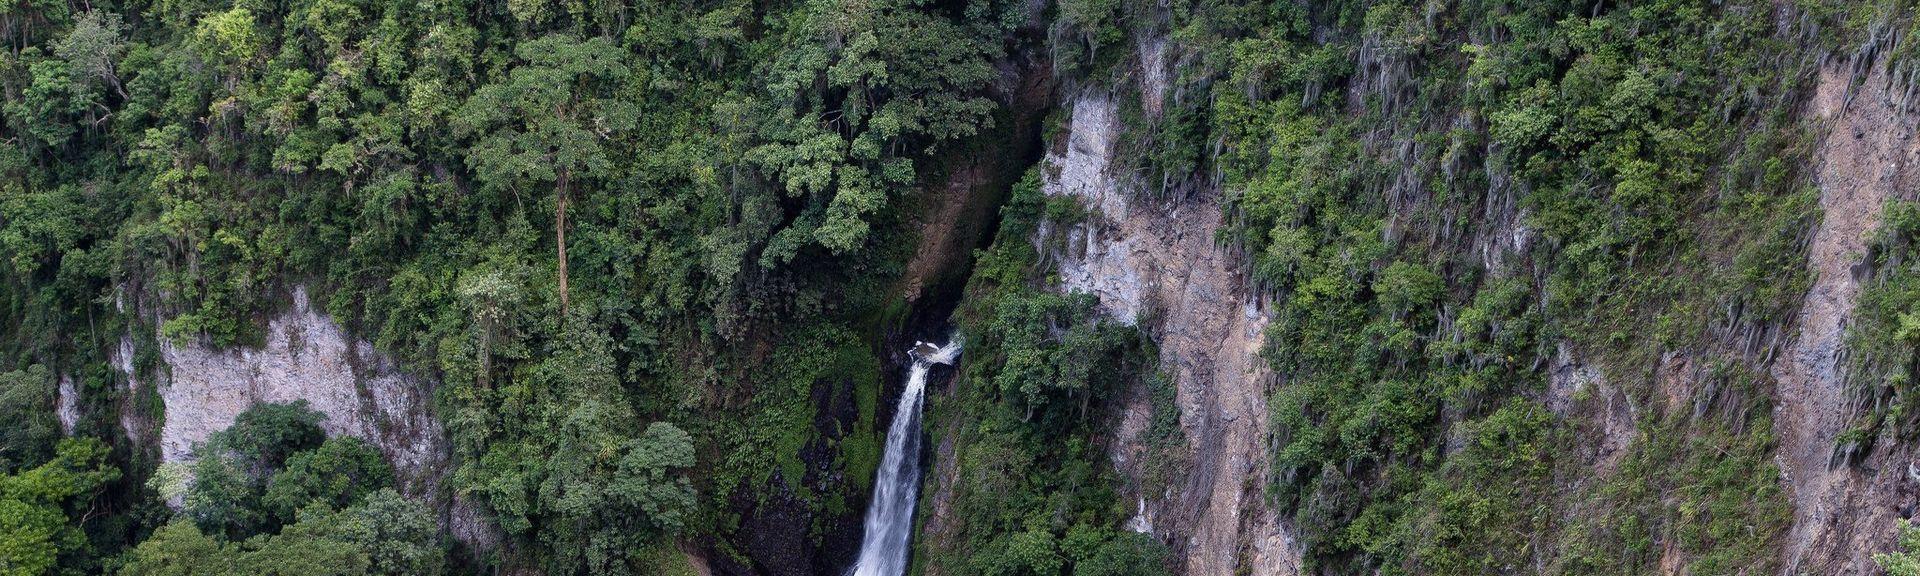 Orosí, Cartago (province), Costa Rica